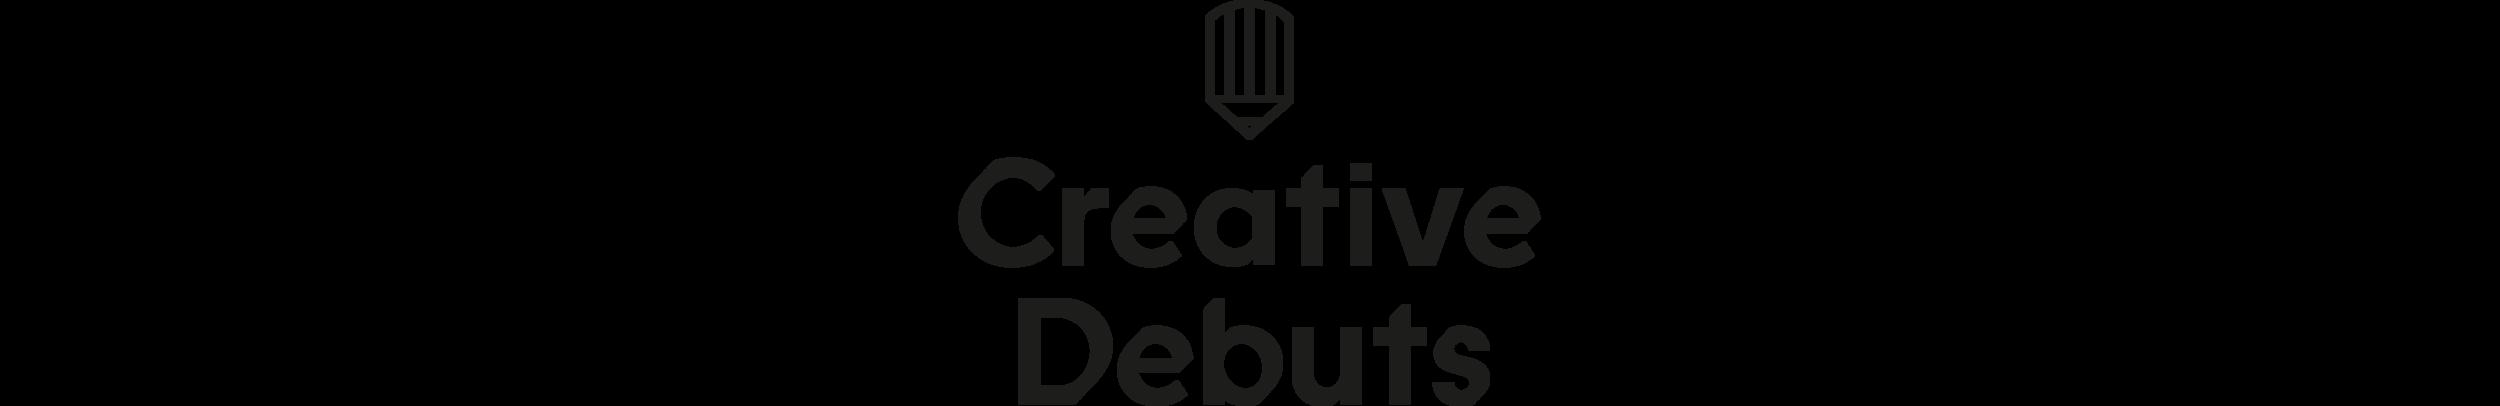 CreativeDebuts.png